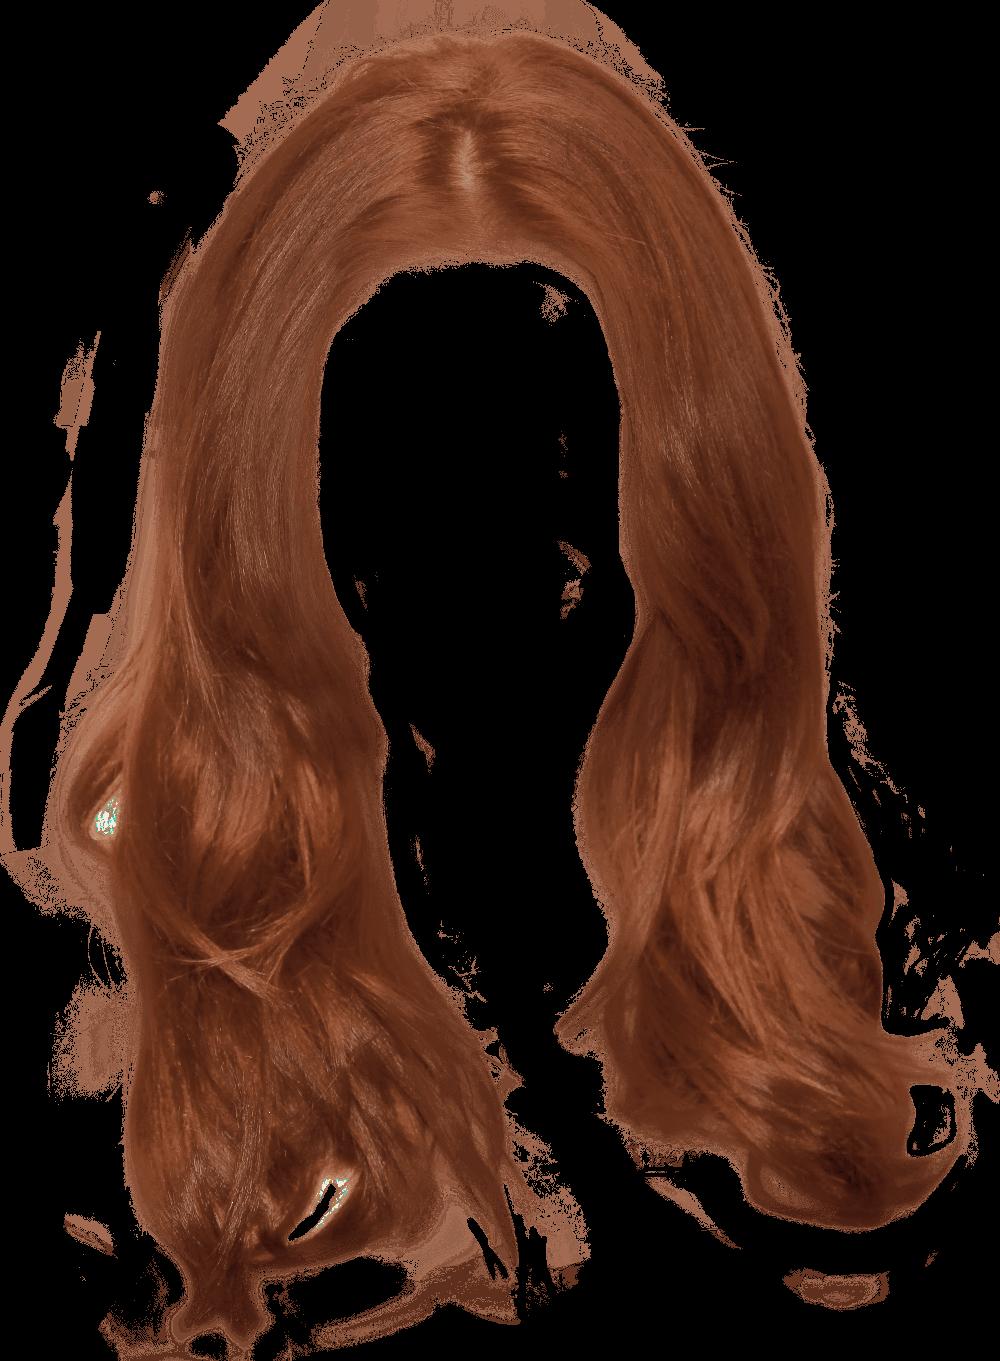 Ginger Long Women Hair Transparent Png Stickpng